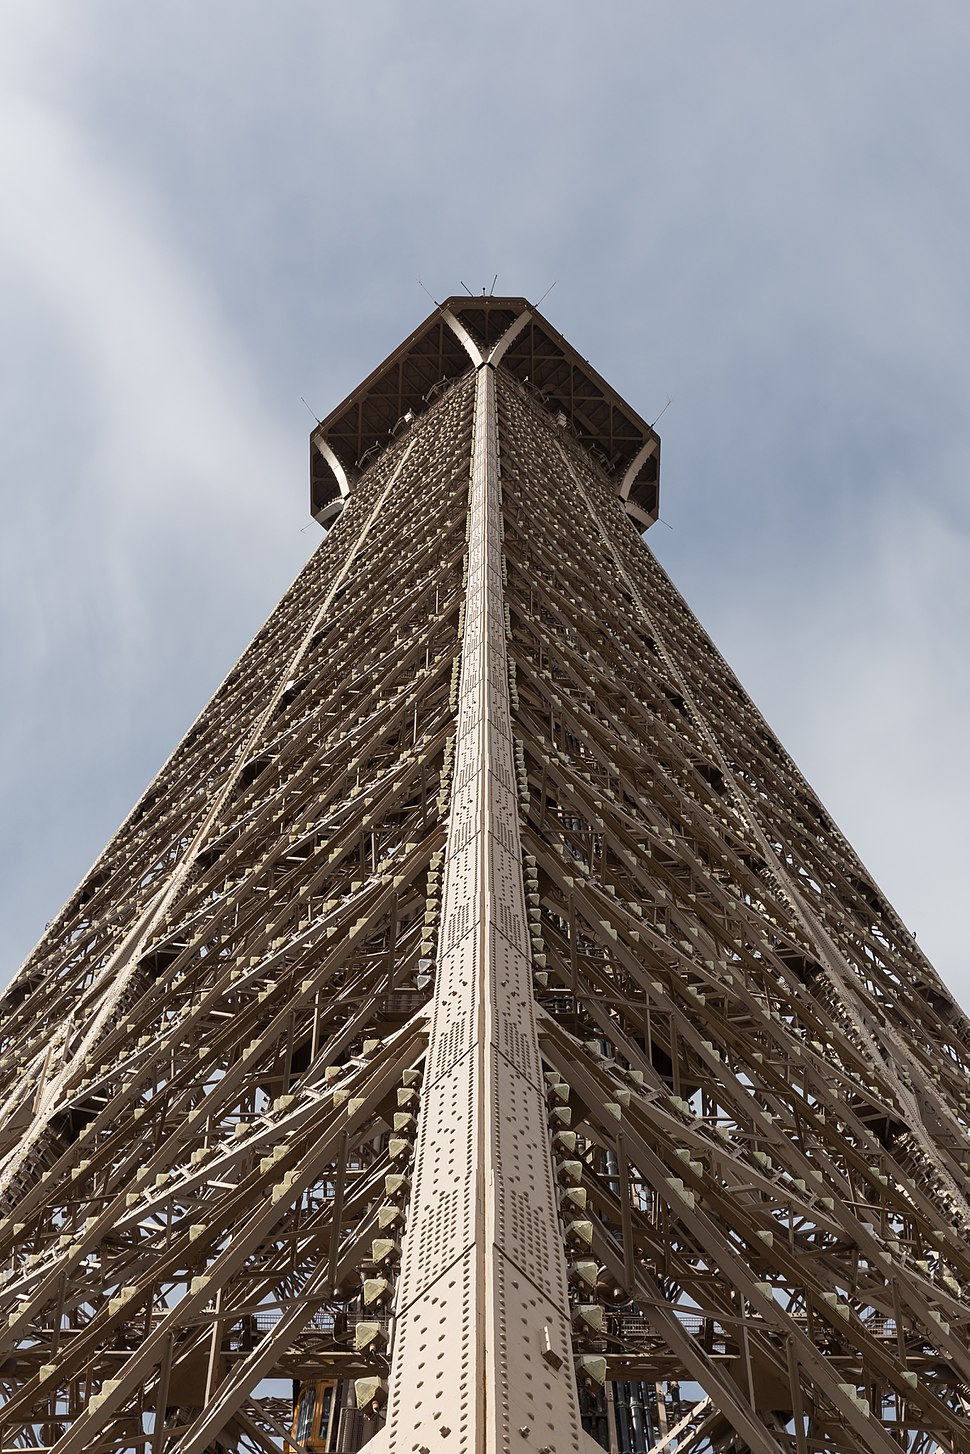 Tour Eiffel - 20150801 15h30 (10621)